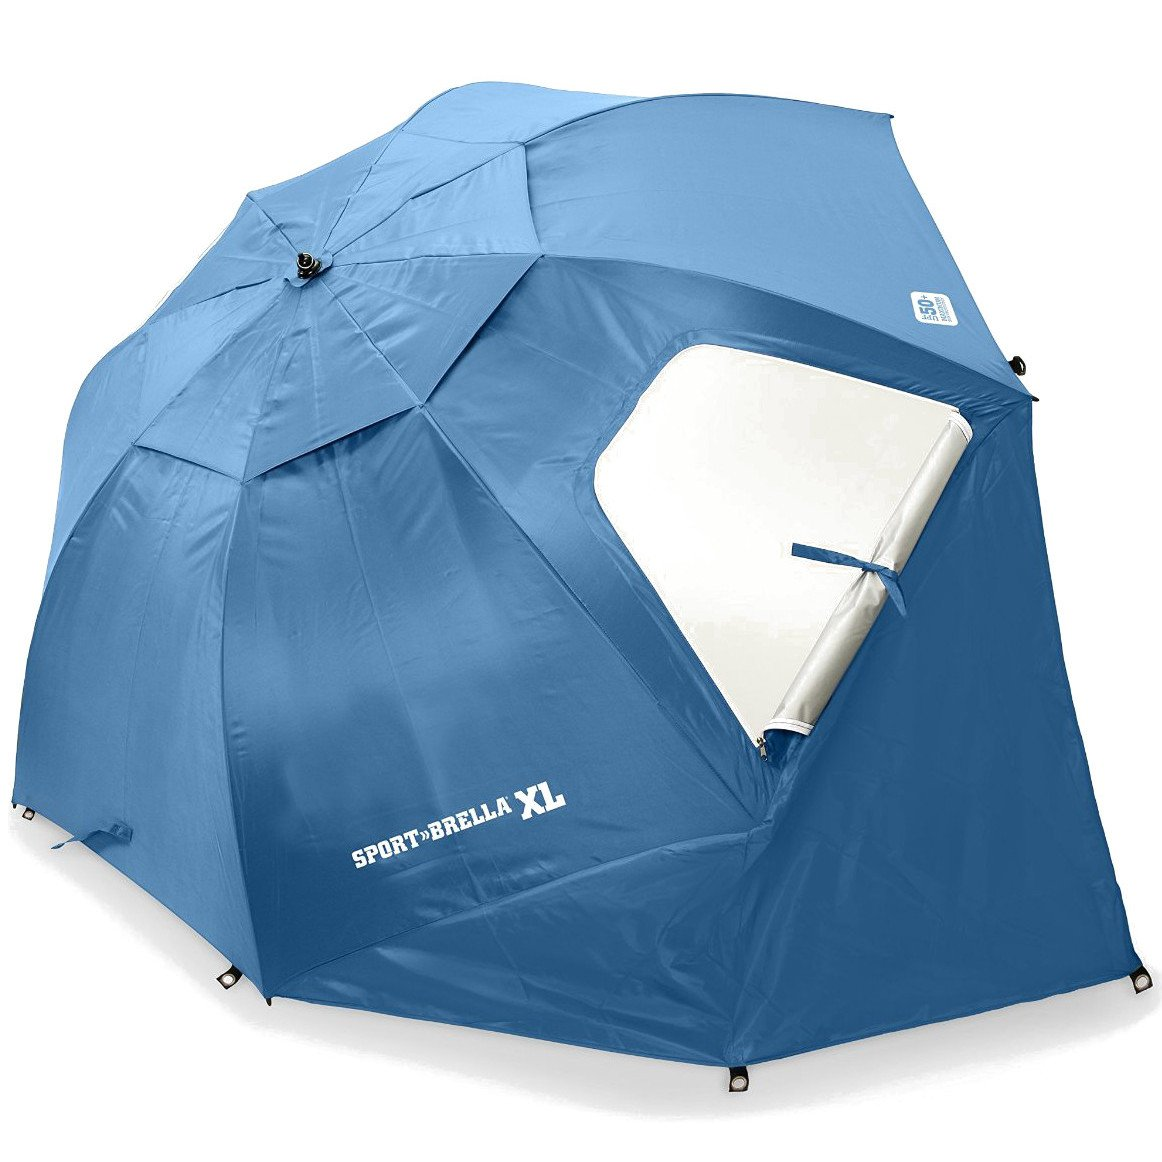 Sport-Brella XL Vented SPF 50+ Sun and Rain Canopy Umbrella for Beach and Sports Events (9-Foot, Steel Blue)